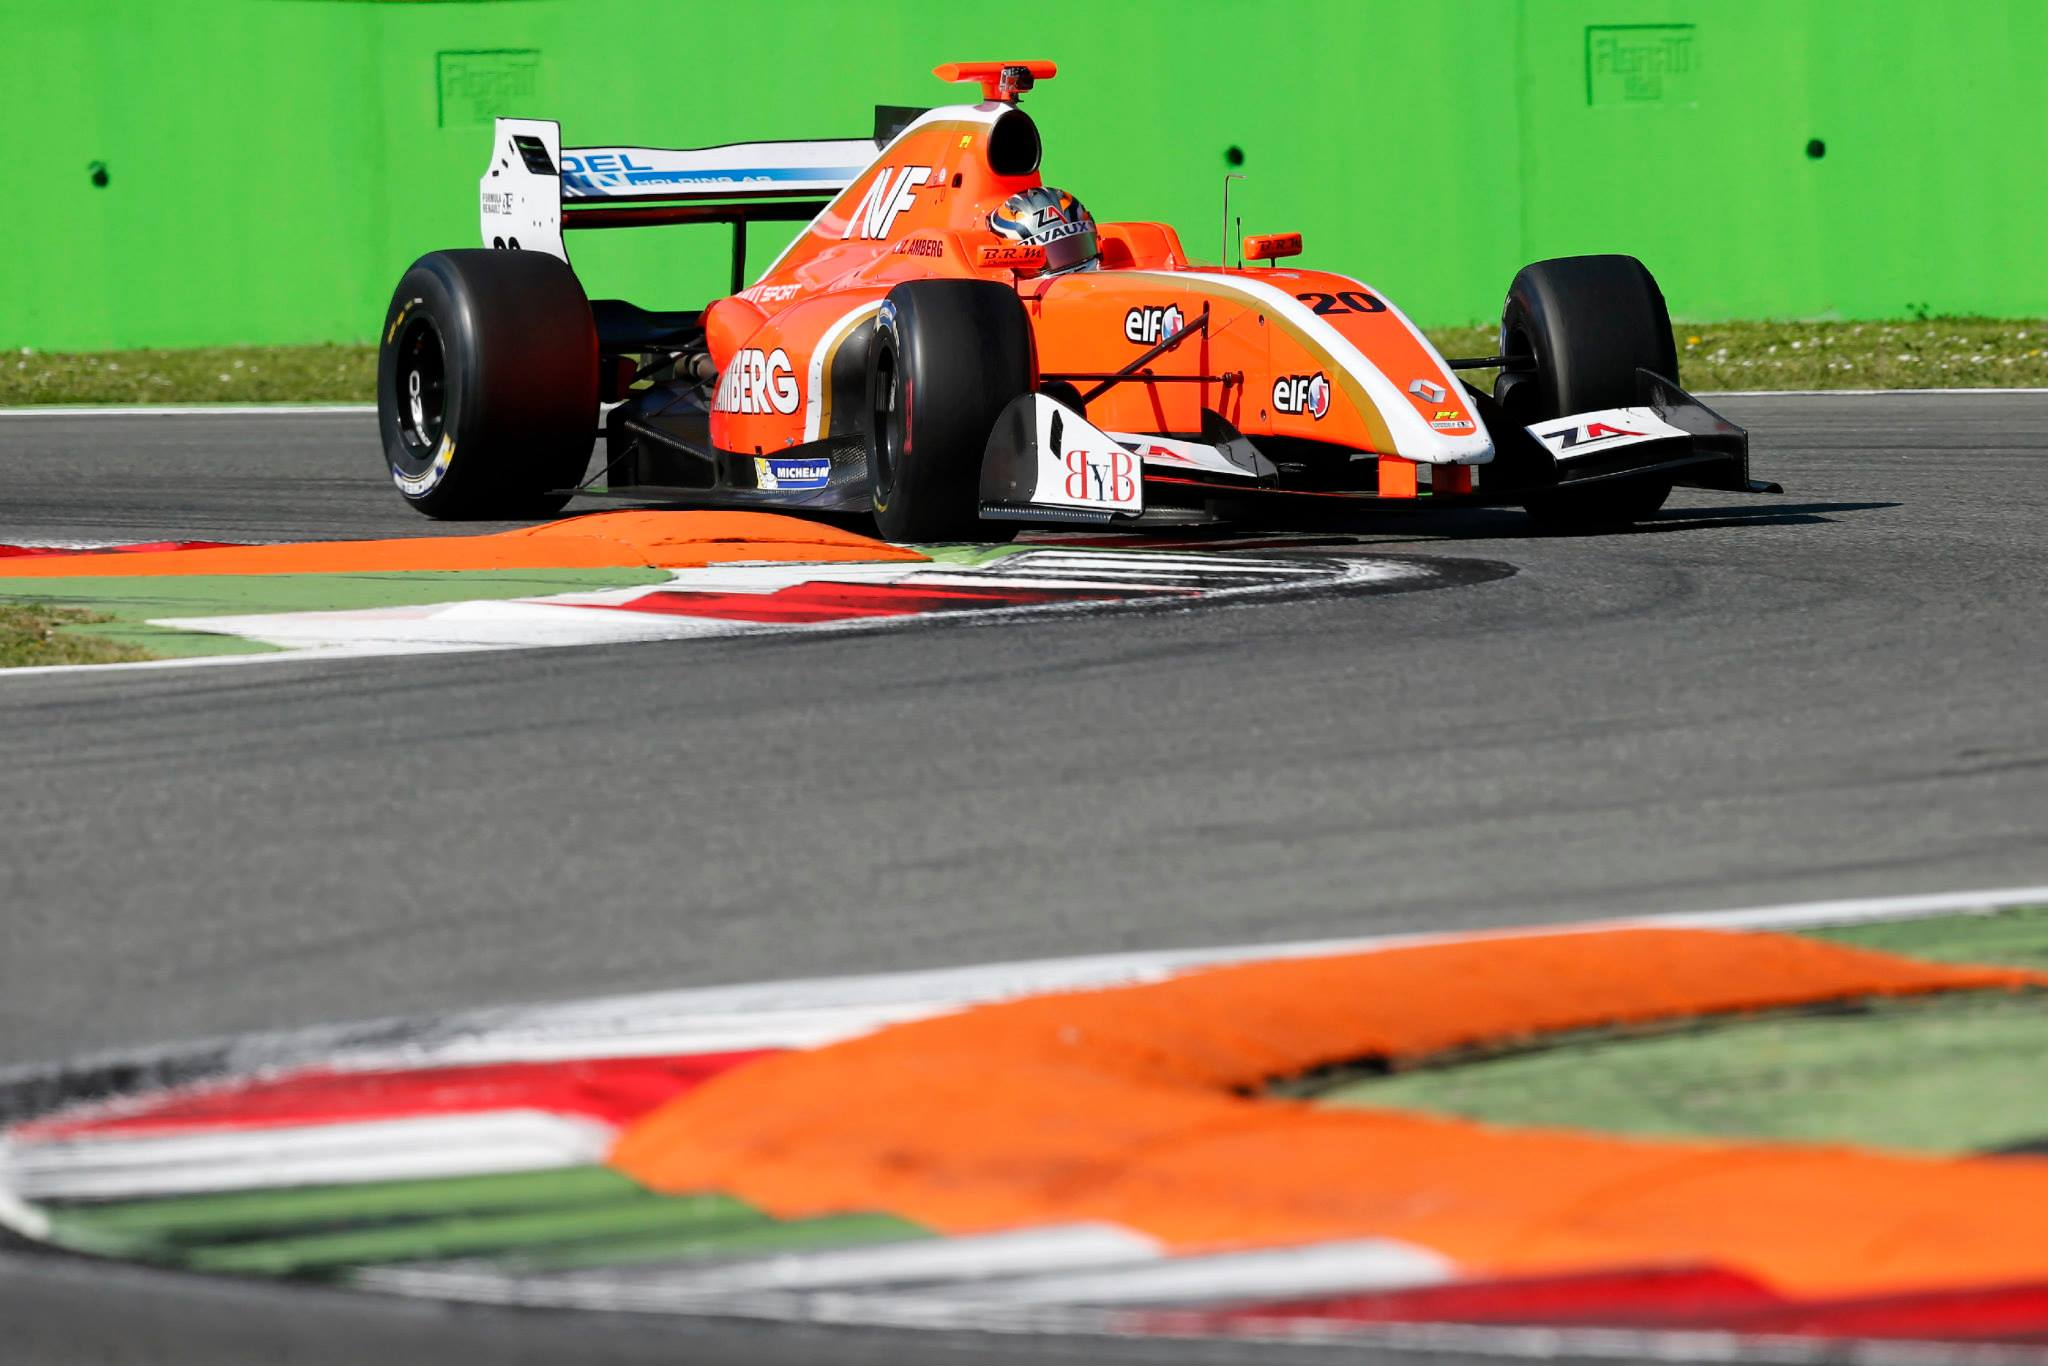 2014 Formula Renault 3.5 Series – Monza – Zoel Amberg